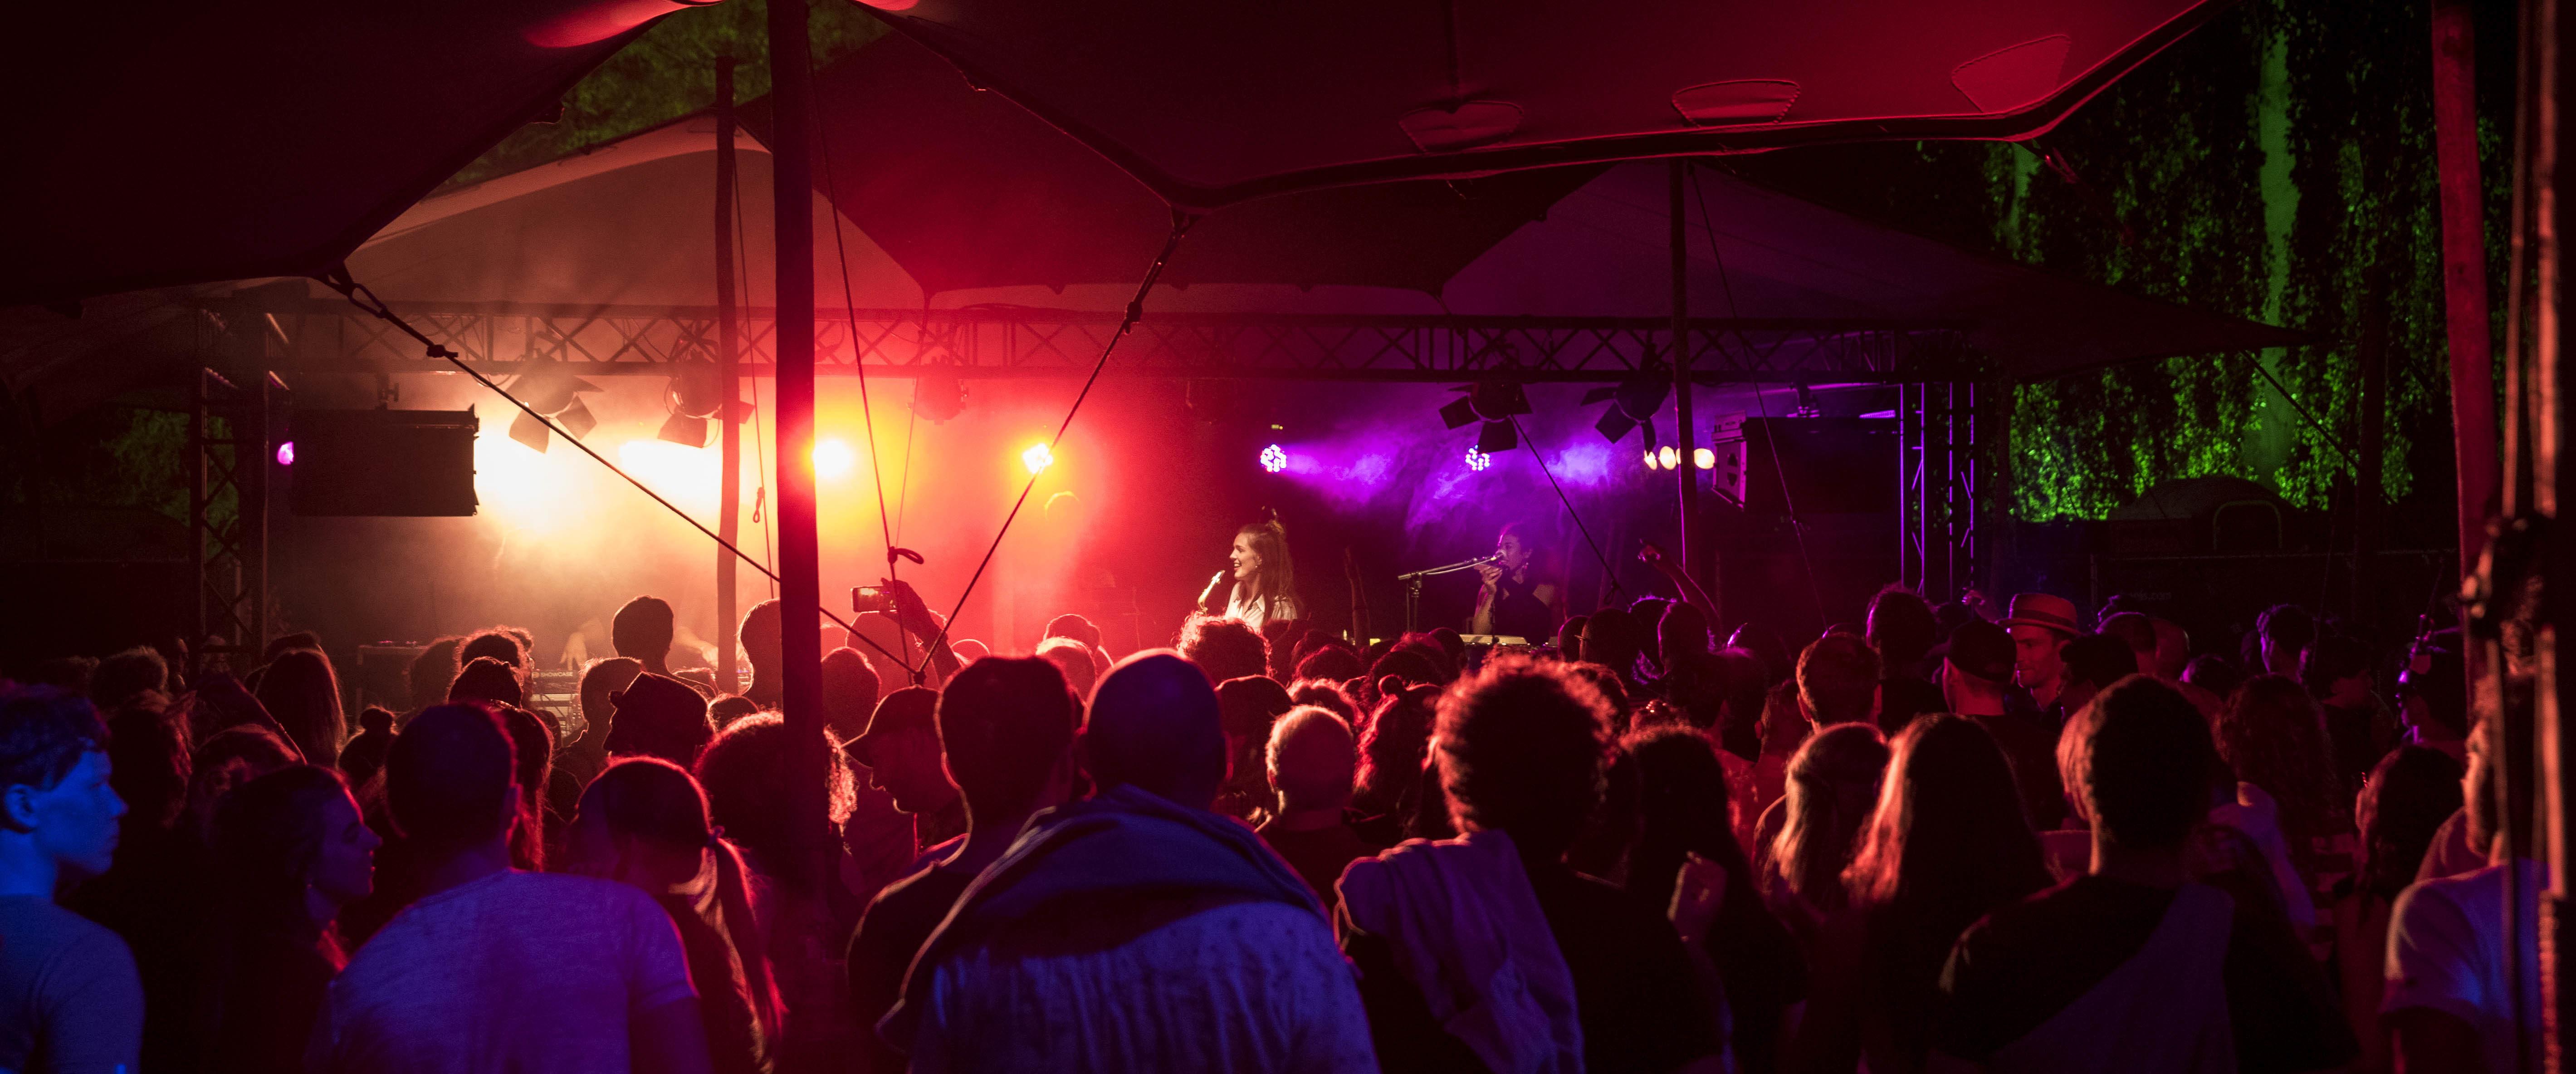 Jazzstad Nijmegen (a)live and kicking 3